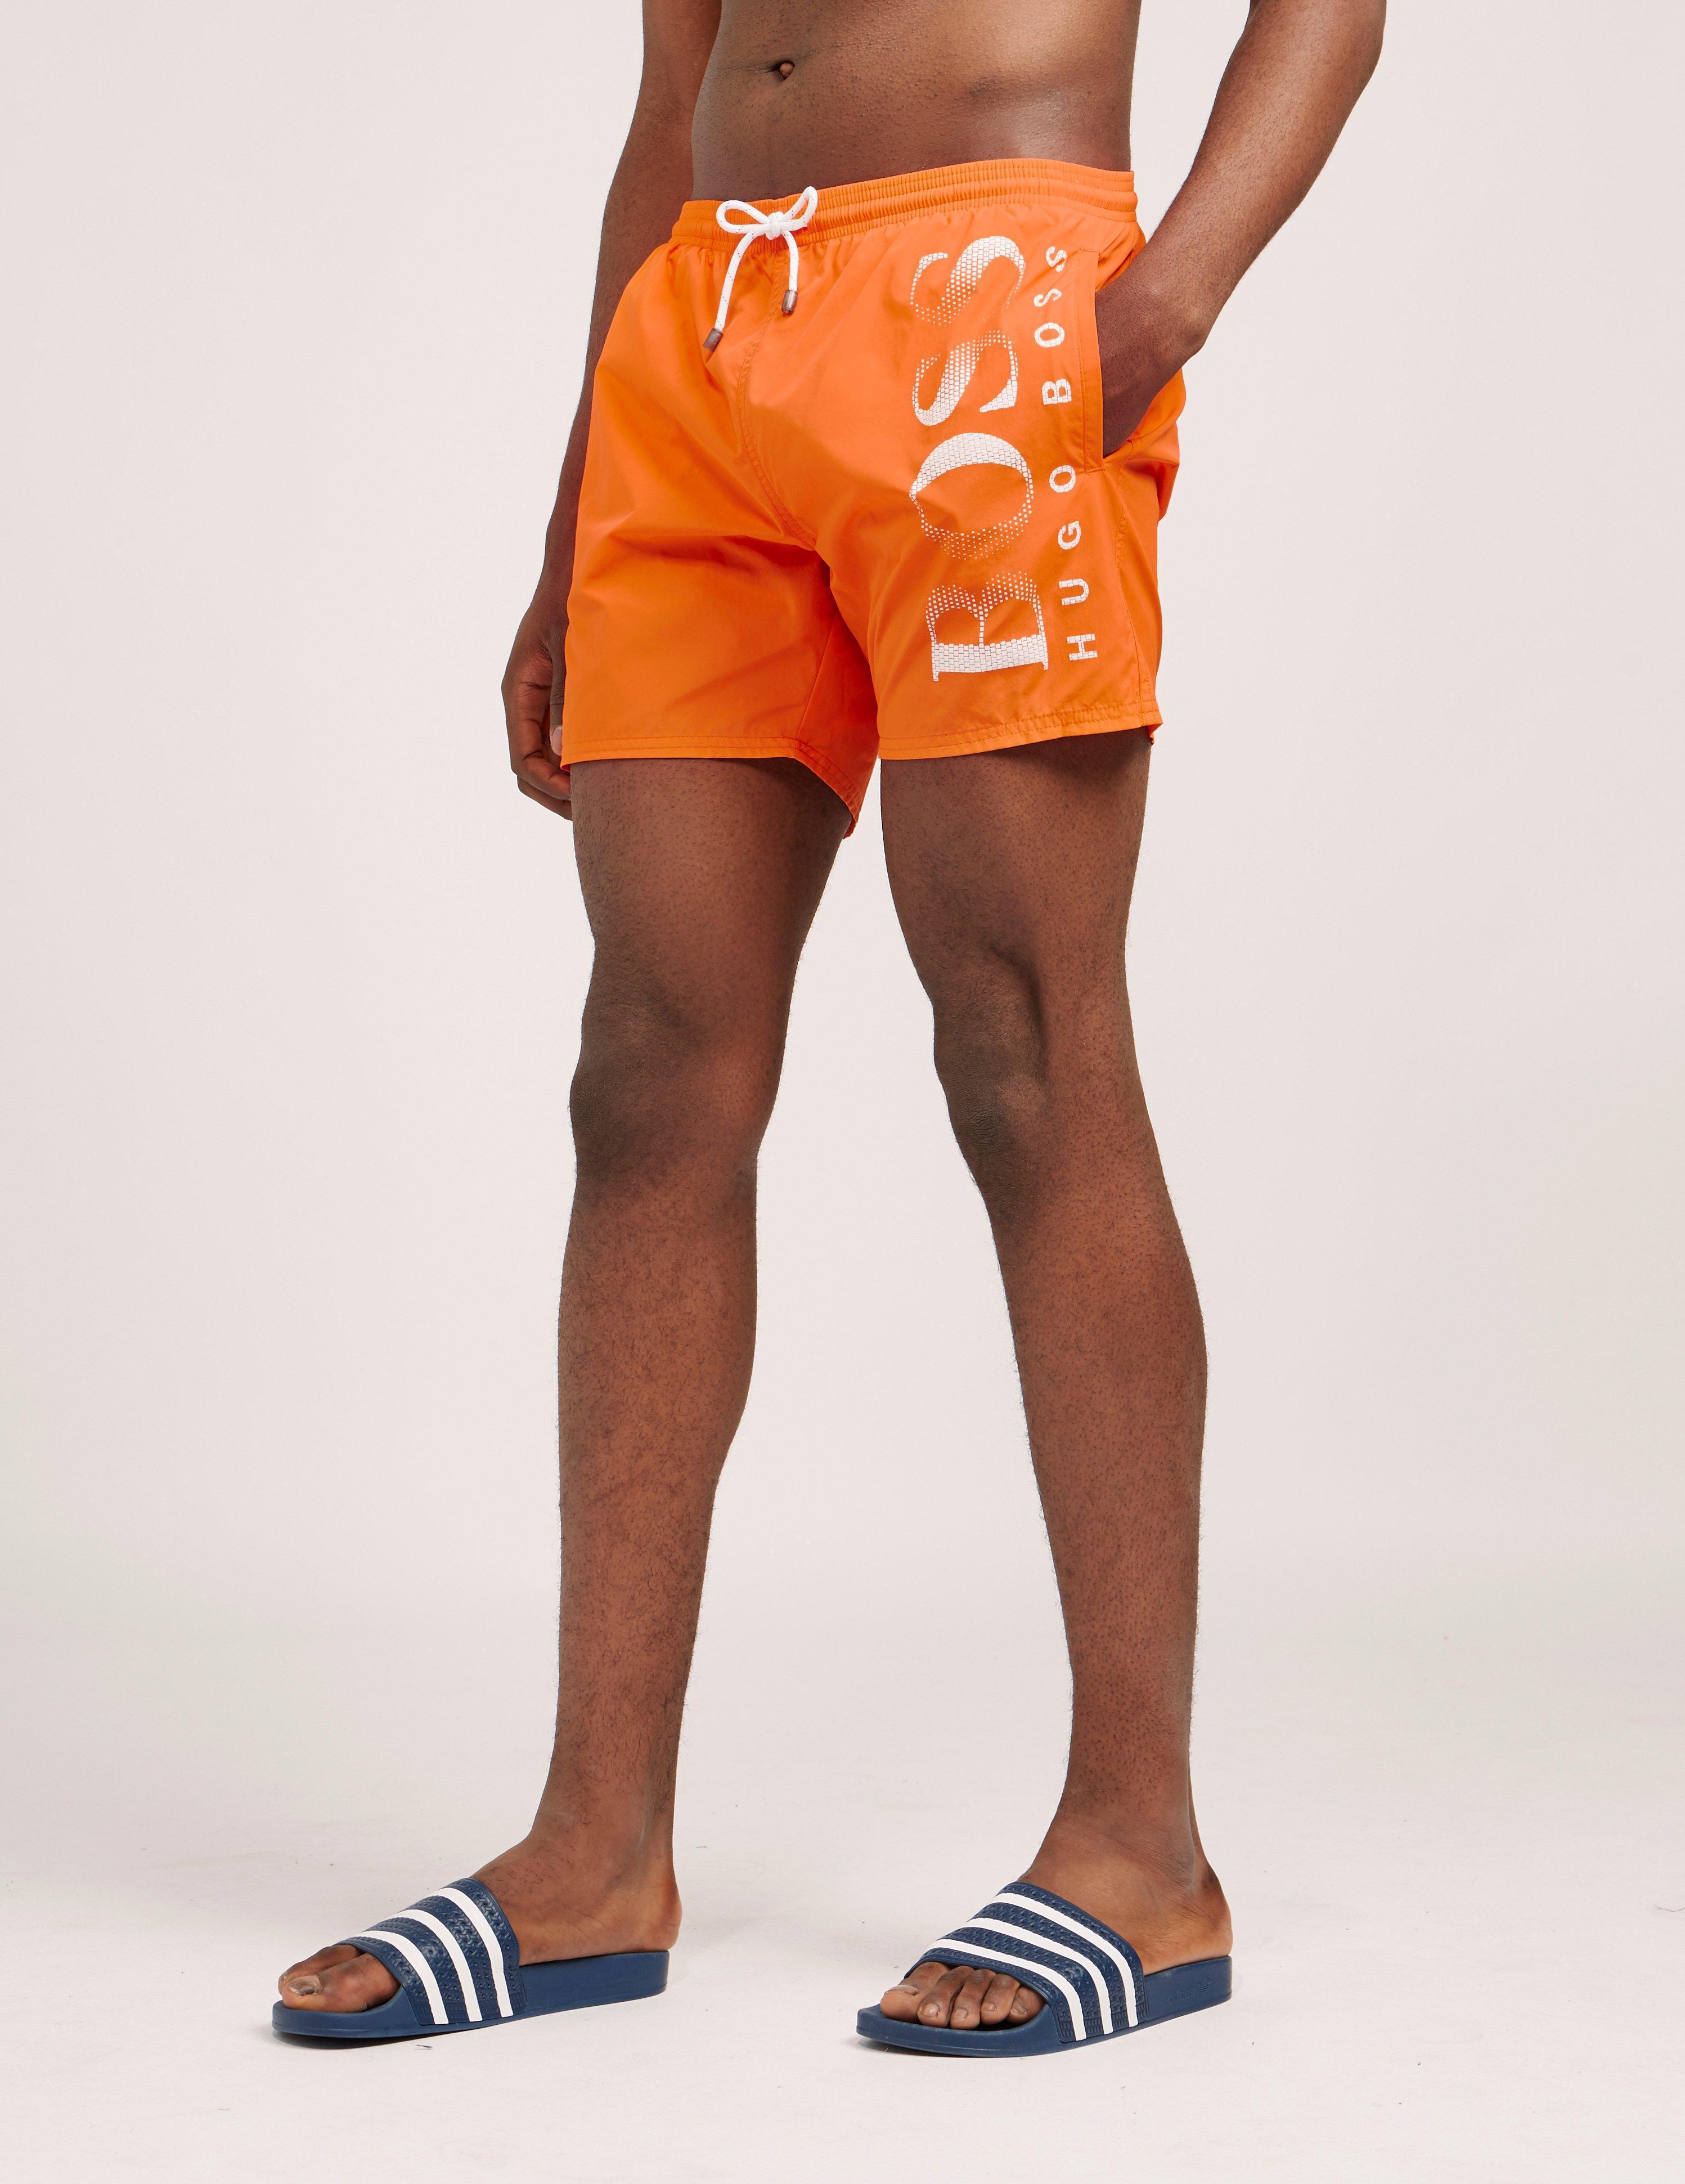 4fd9d5c02 BOSS Octopus Swim Shorts Orange in Orange for Men - Lyst